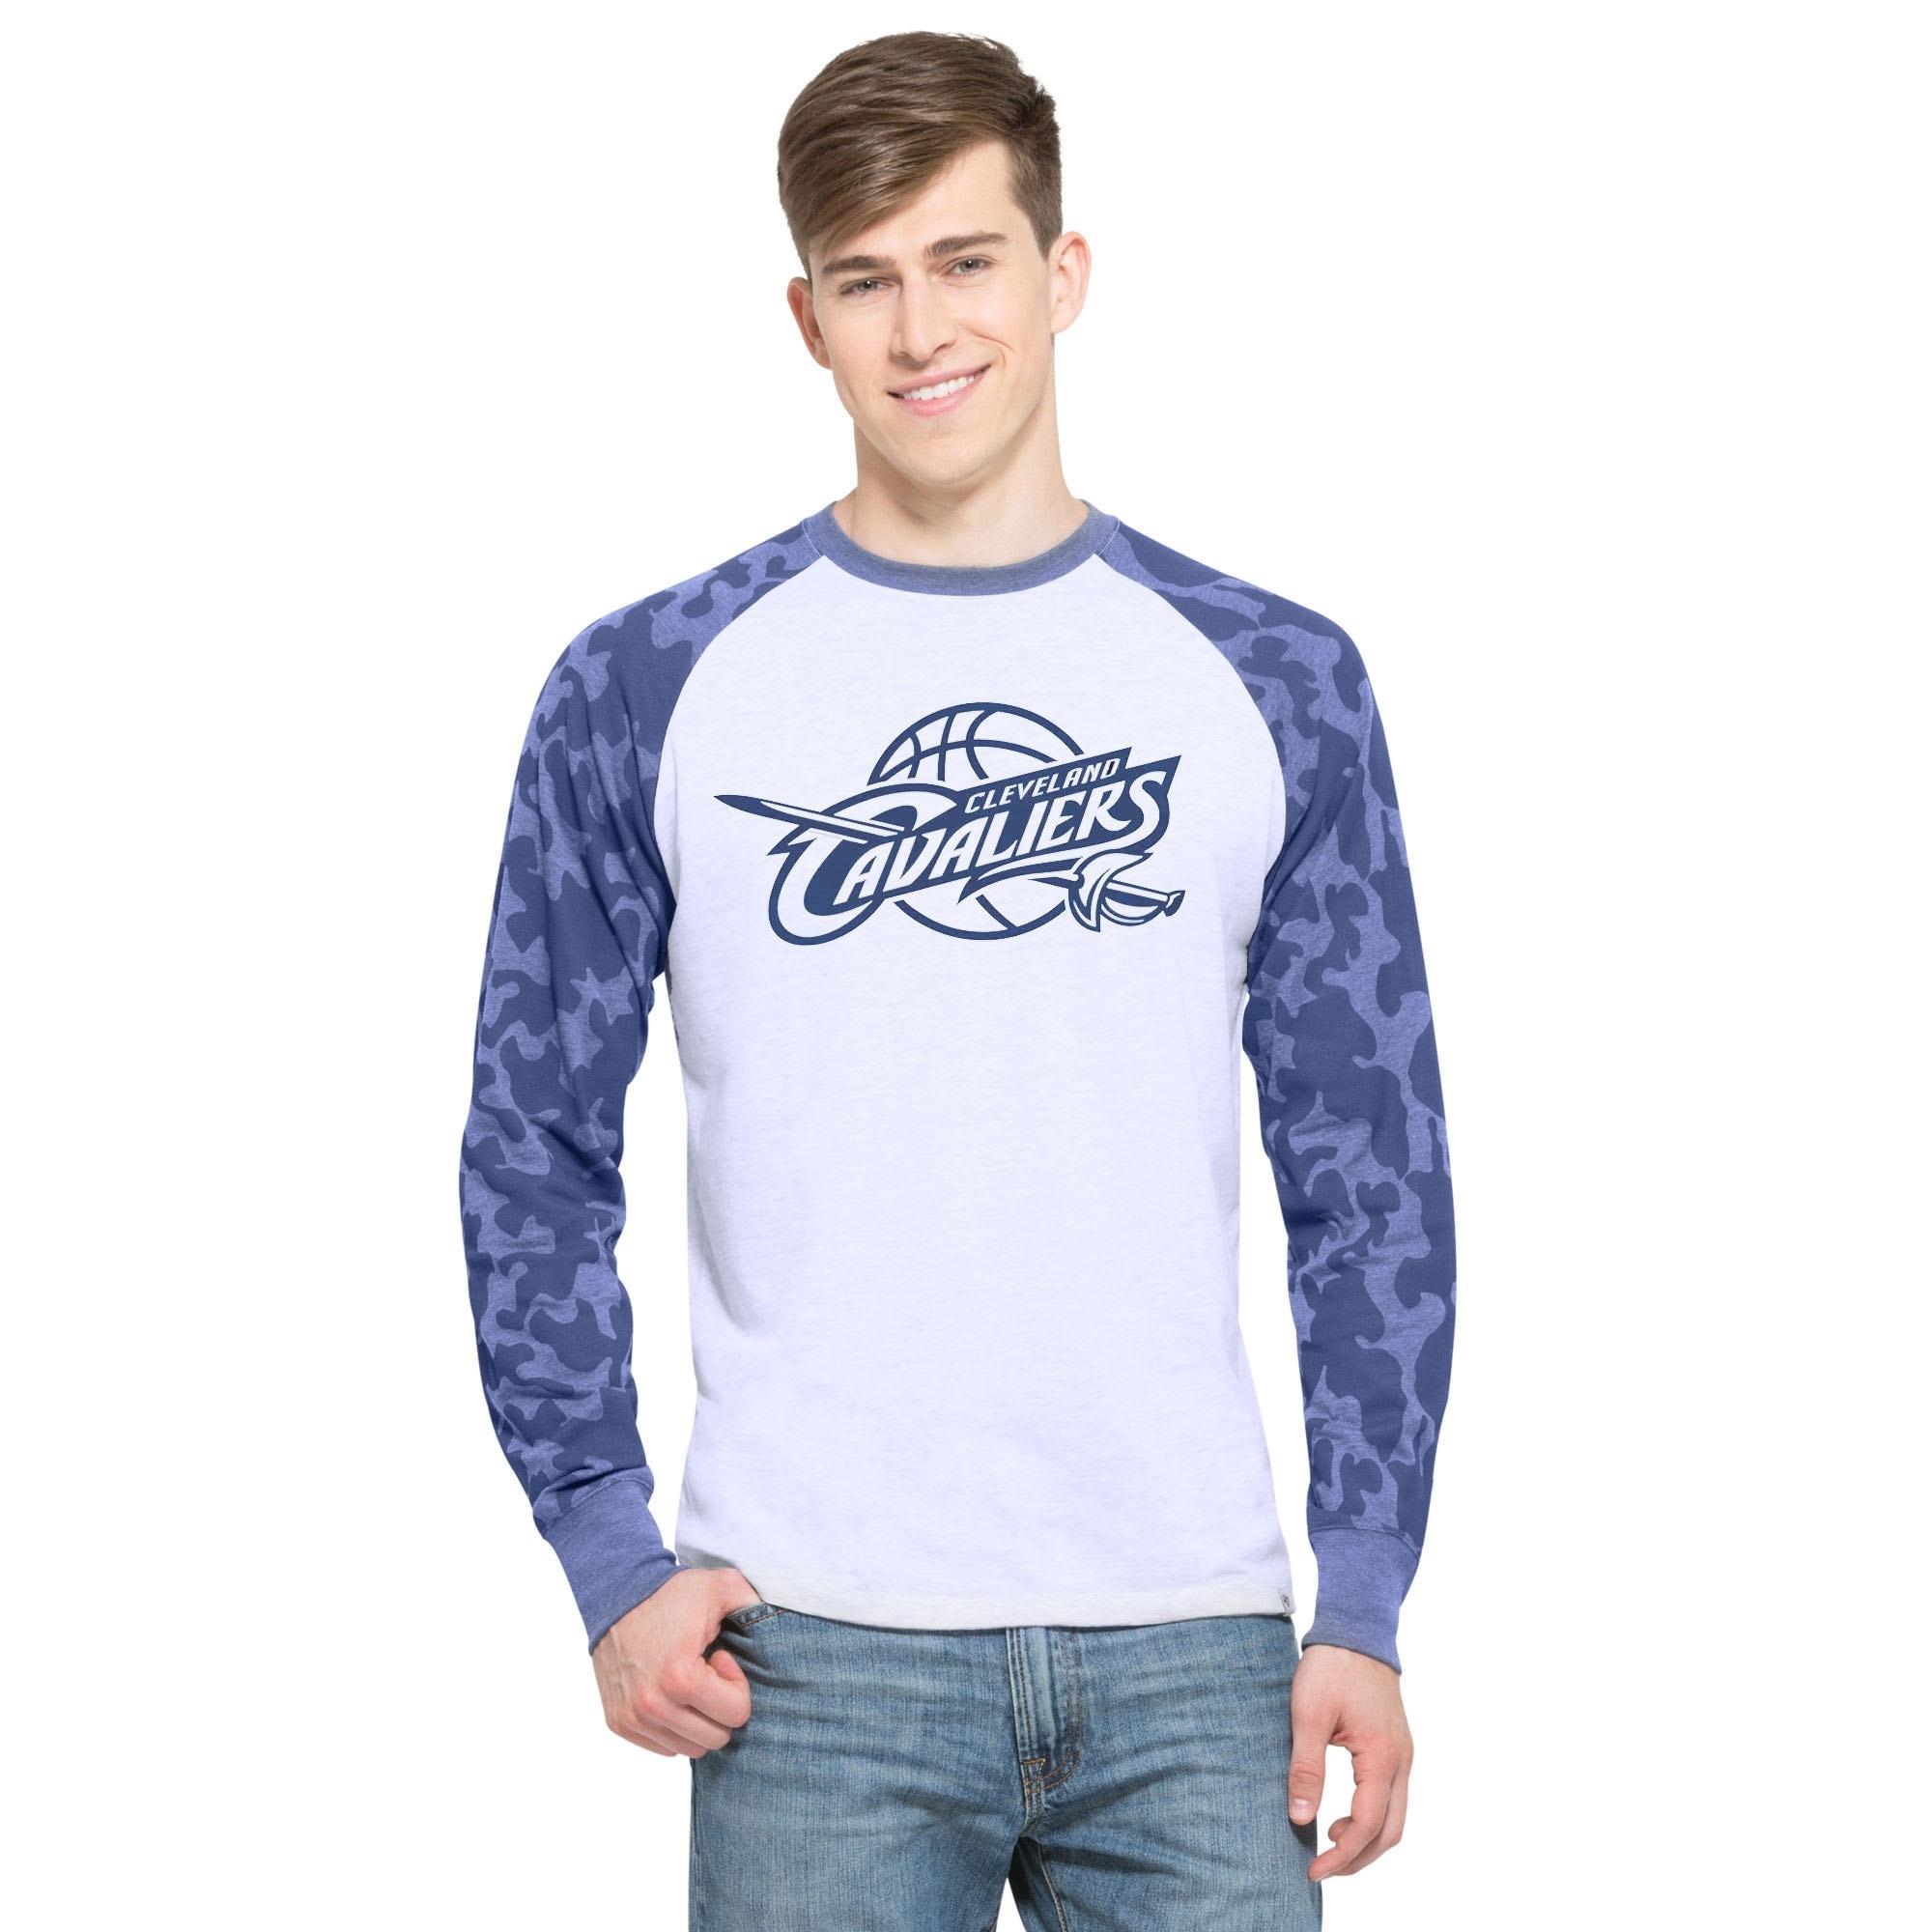 Cleveland Cavaliers '47 Stealth Camo Raglan Long Sleeve T-Shirt - Ash